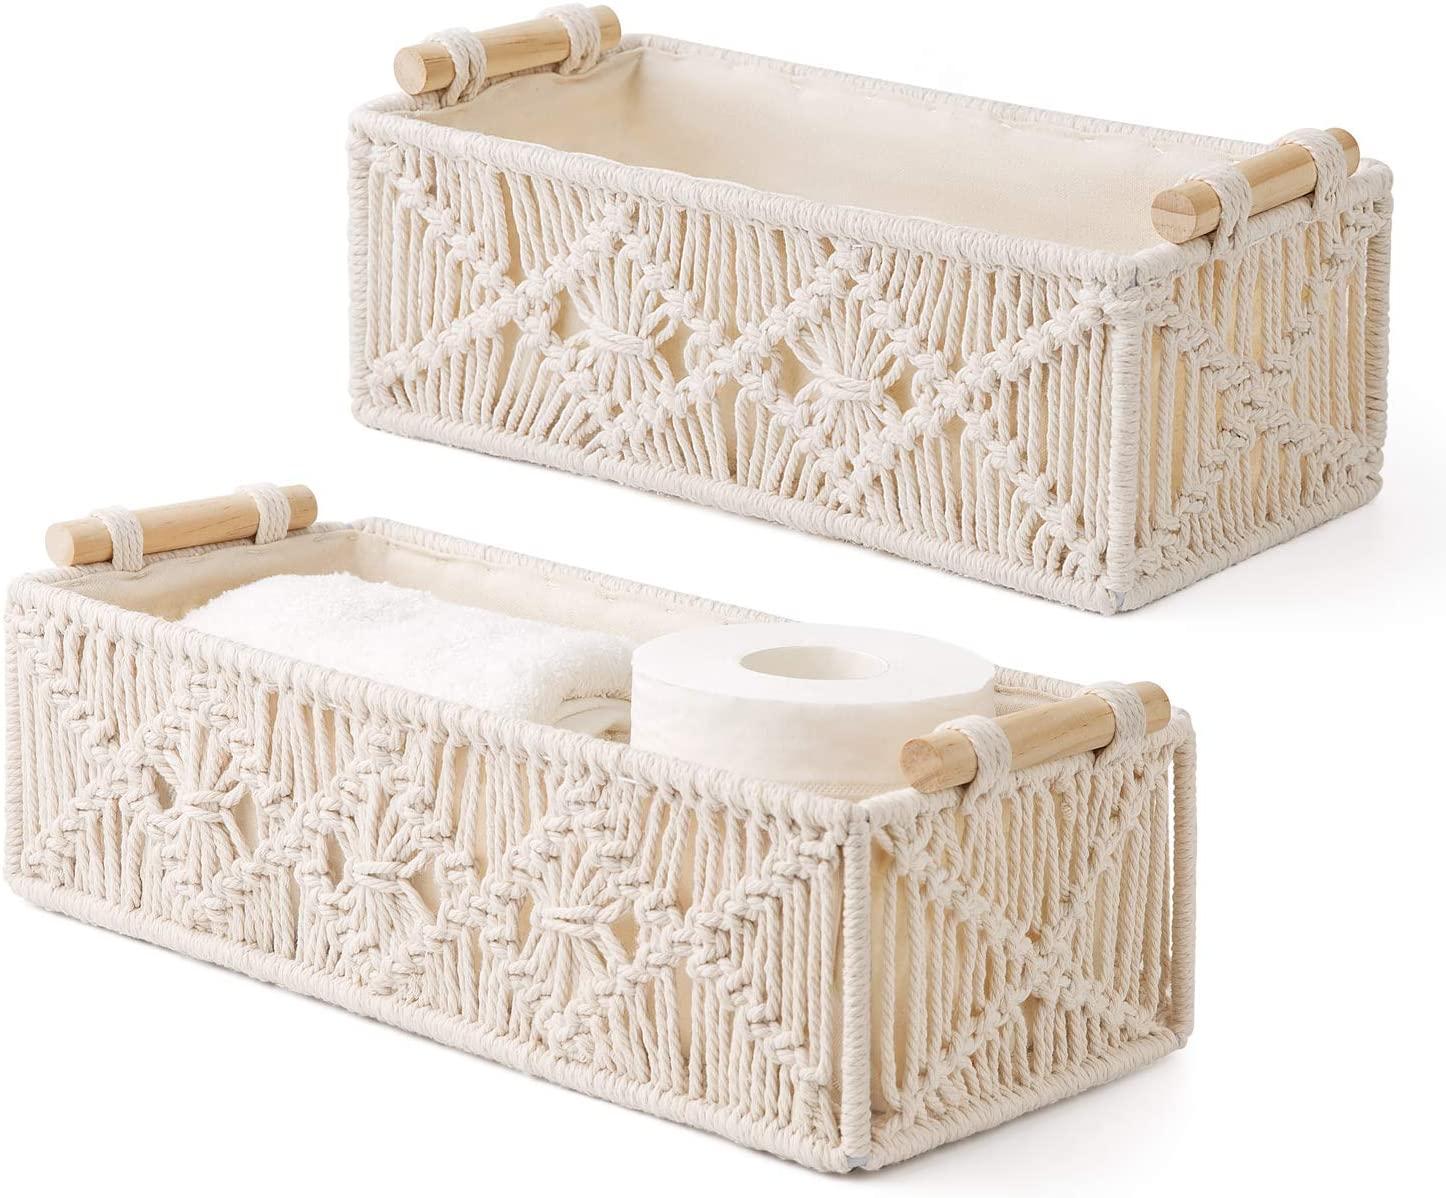 Mkono Macrame Storage Baskets Decor Box Handmade Woven Decorative Countertop Toilet Tank Shelf Cabinet Organizer Boho Decor for Bedroom Nursery Livingroom Set of 2, Ivory